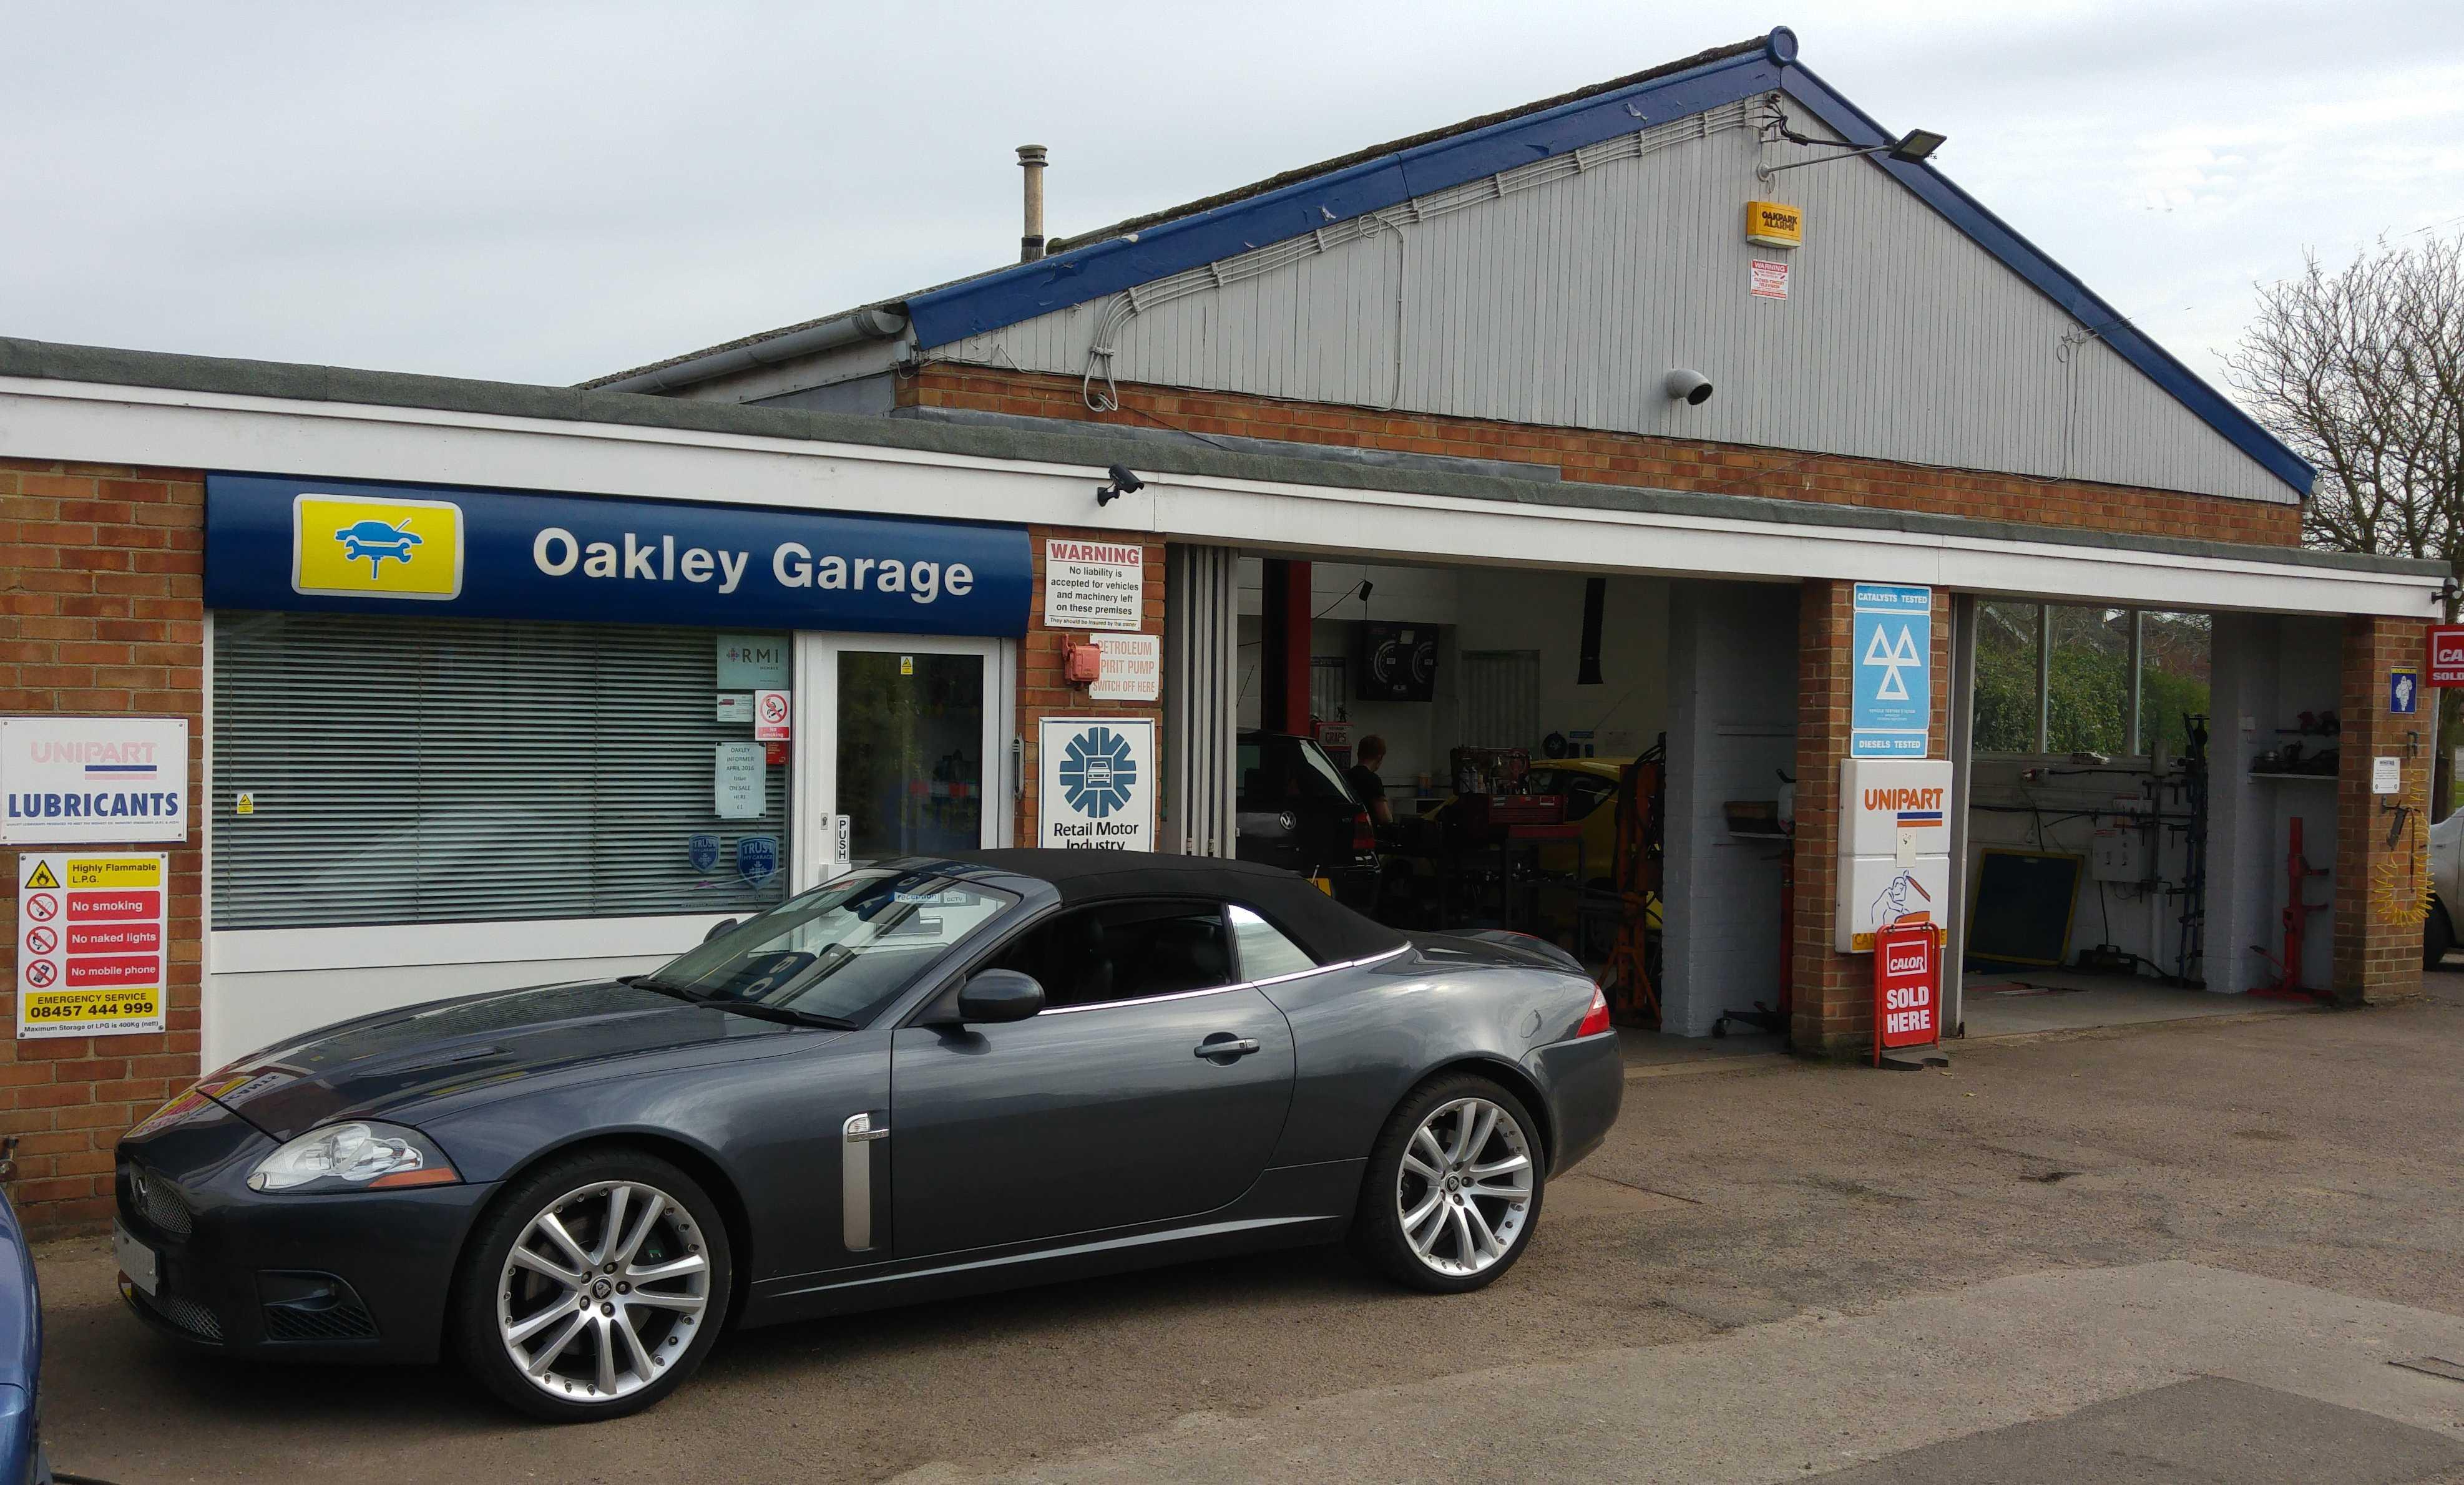 Oakley Garage